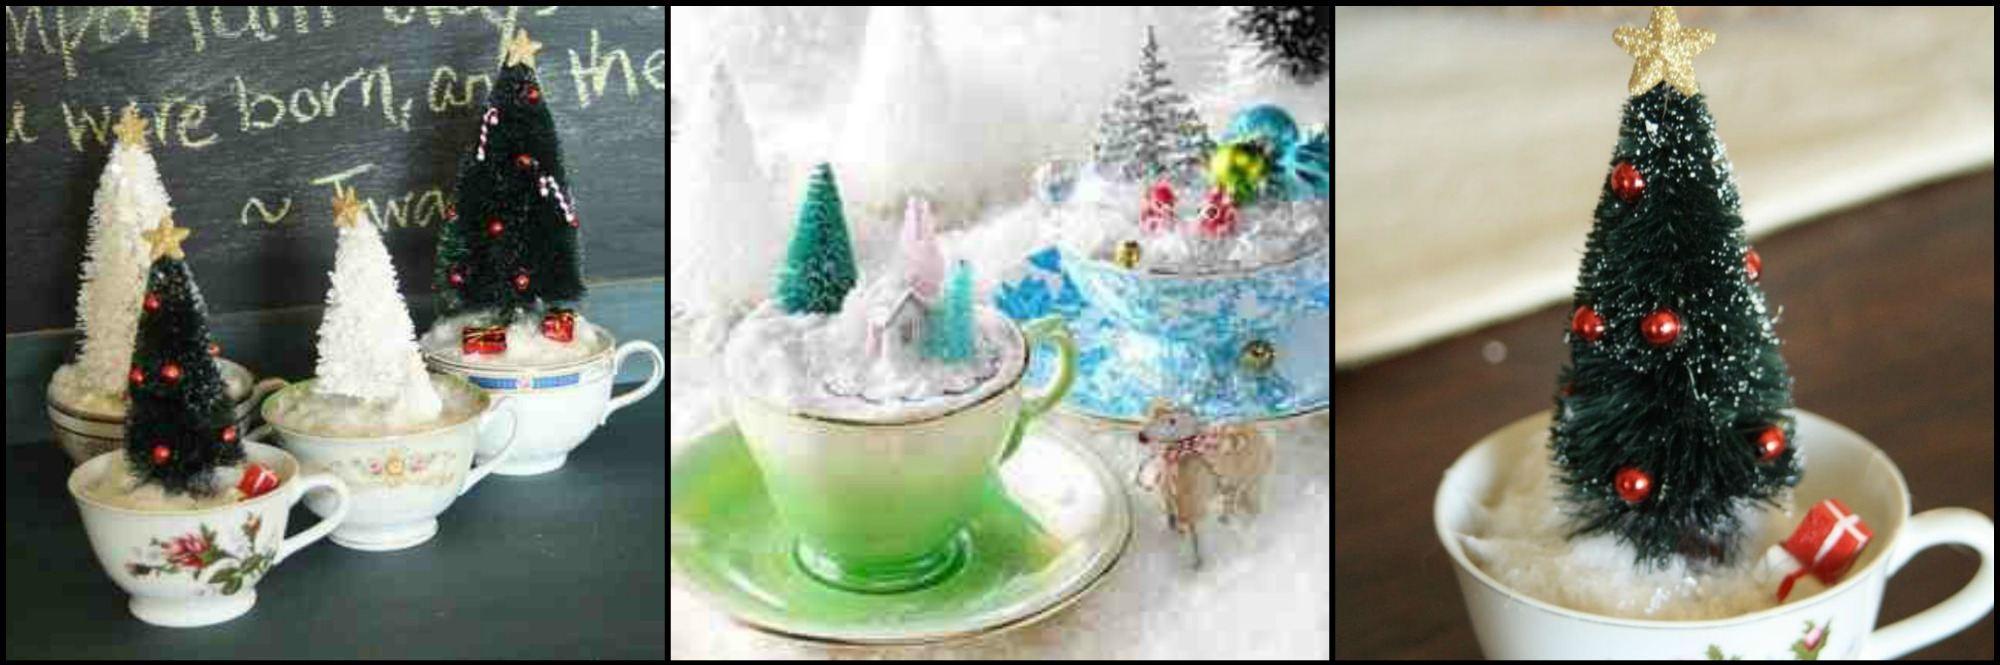 christmas trees in teacups